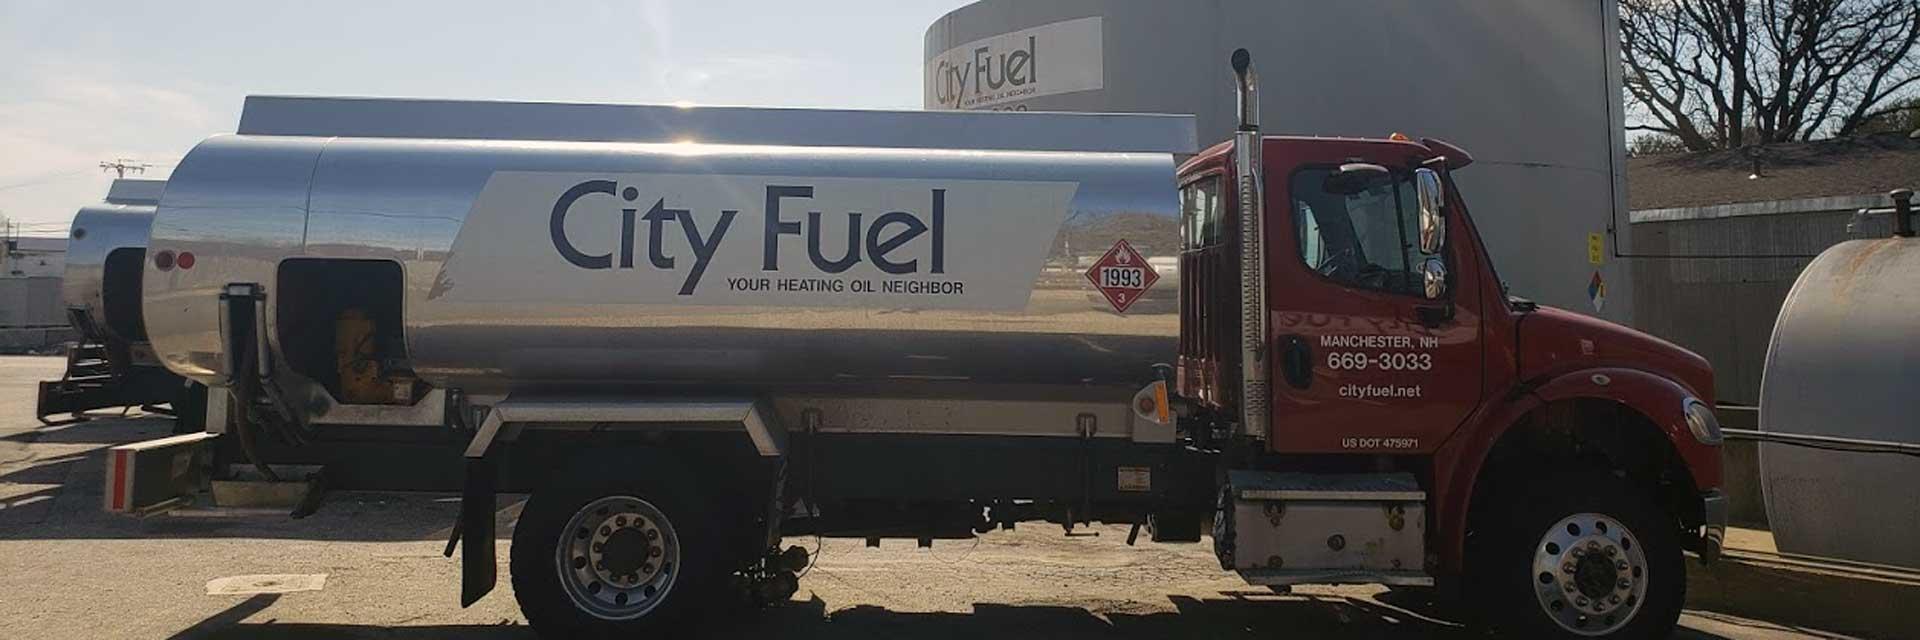 CityFuel Truck